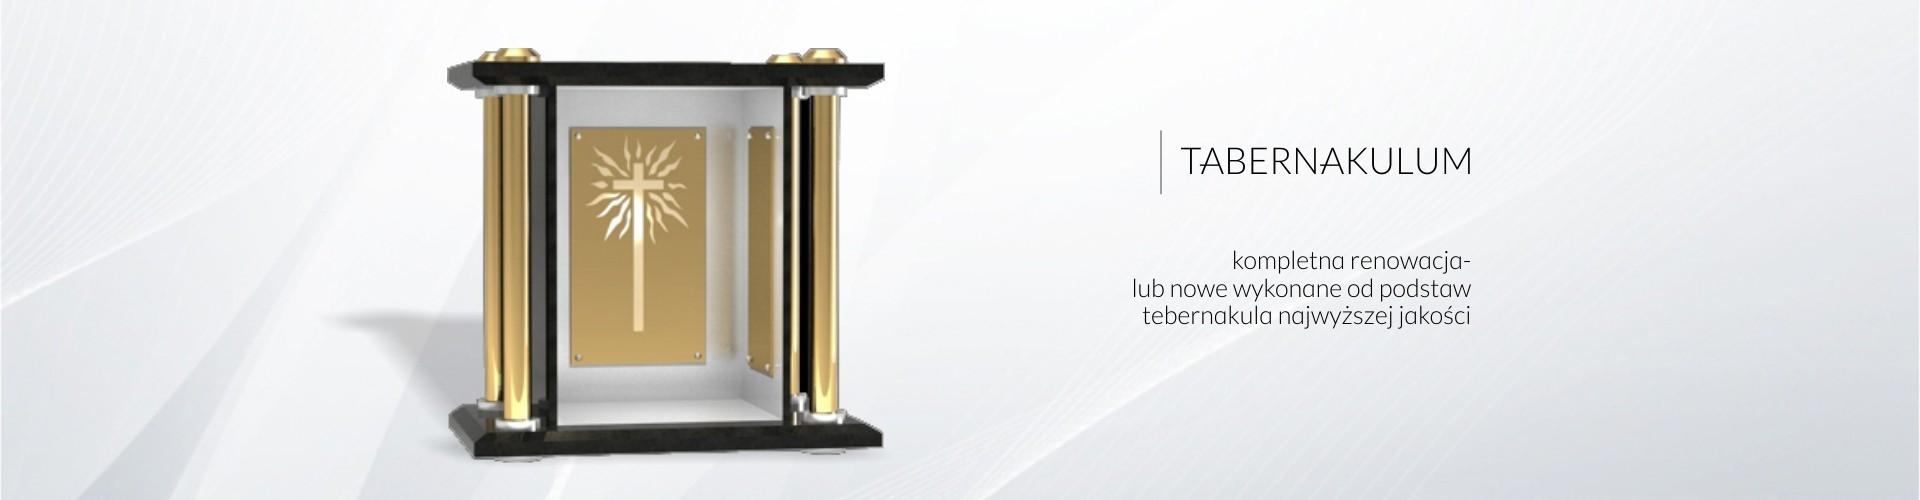 Tabernakulum